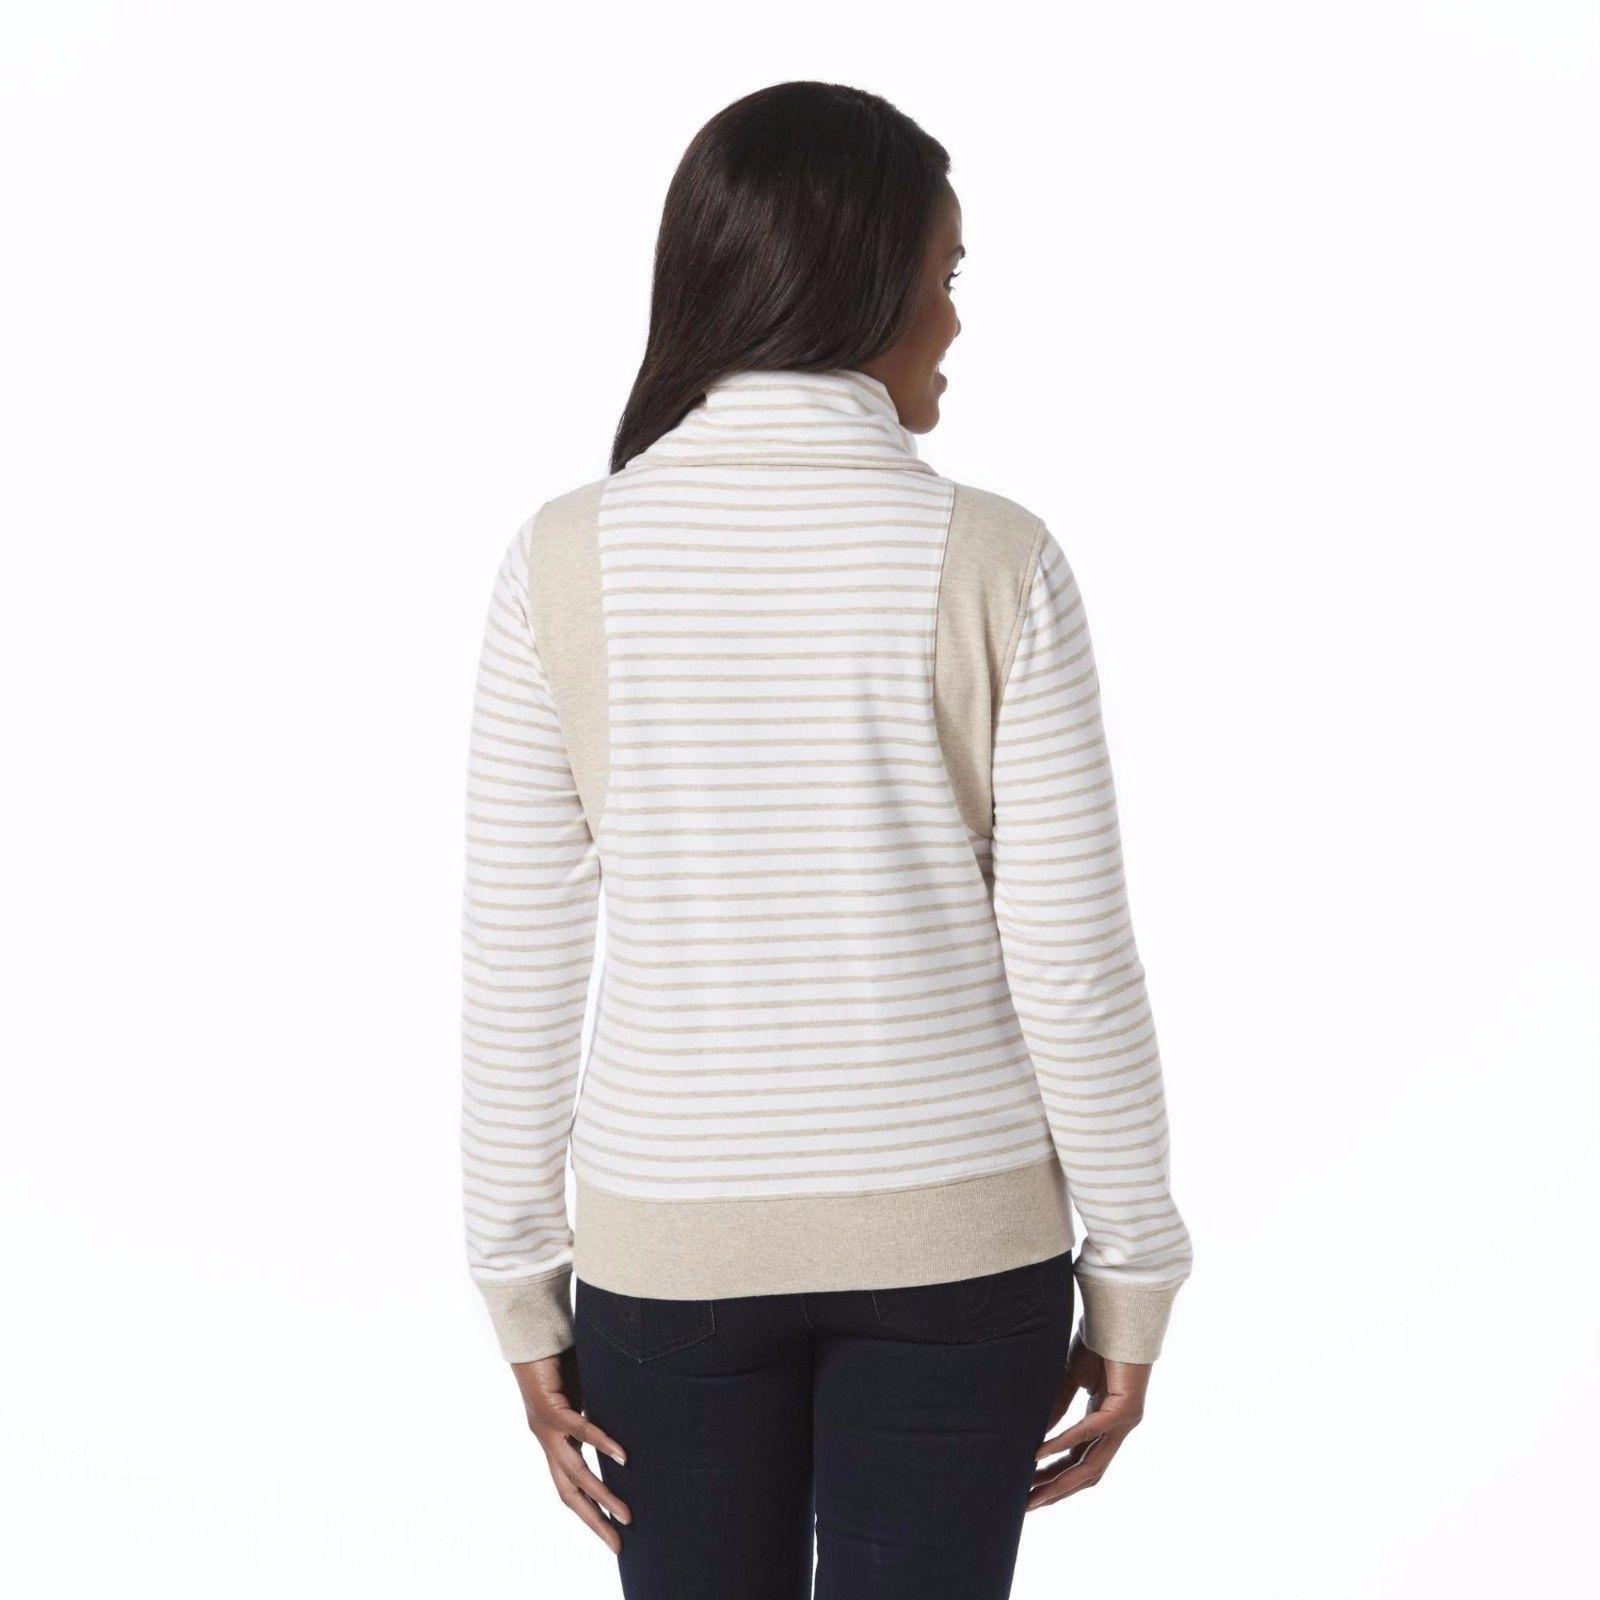 Women's Laura Scott Cowl Neck Striped Zipper Jacket Brown Sugar Size Large NEW